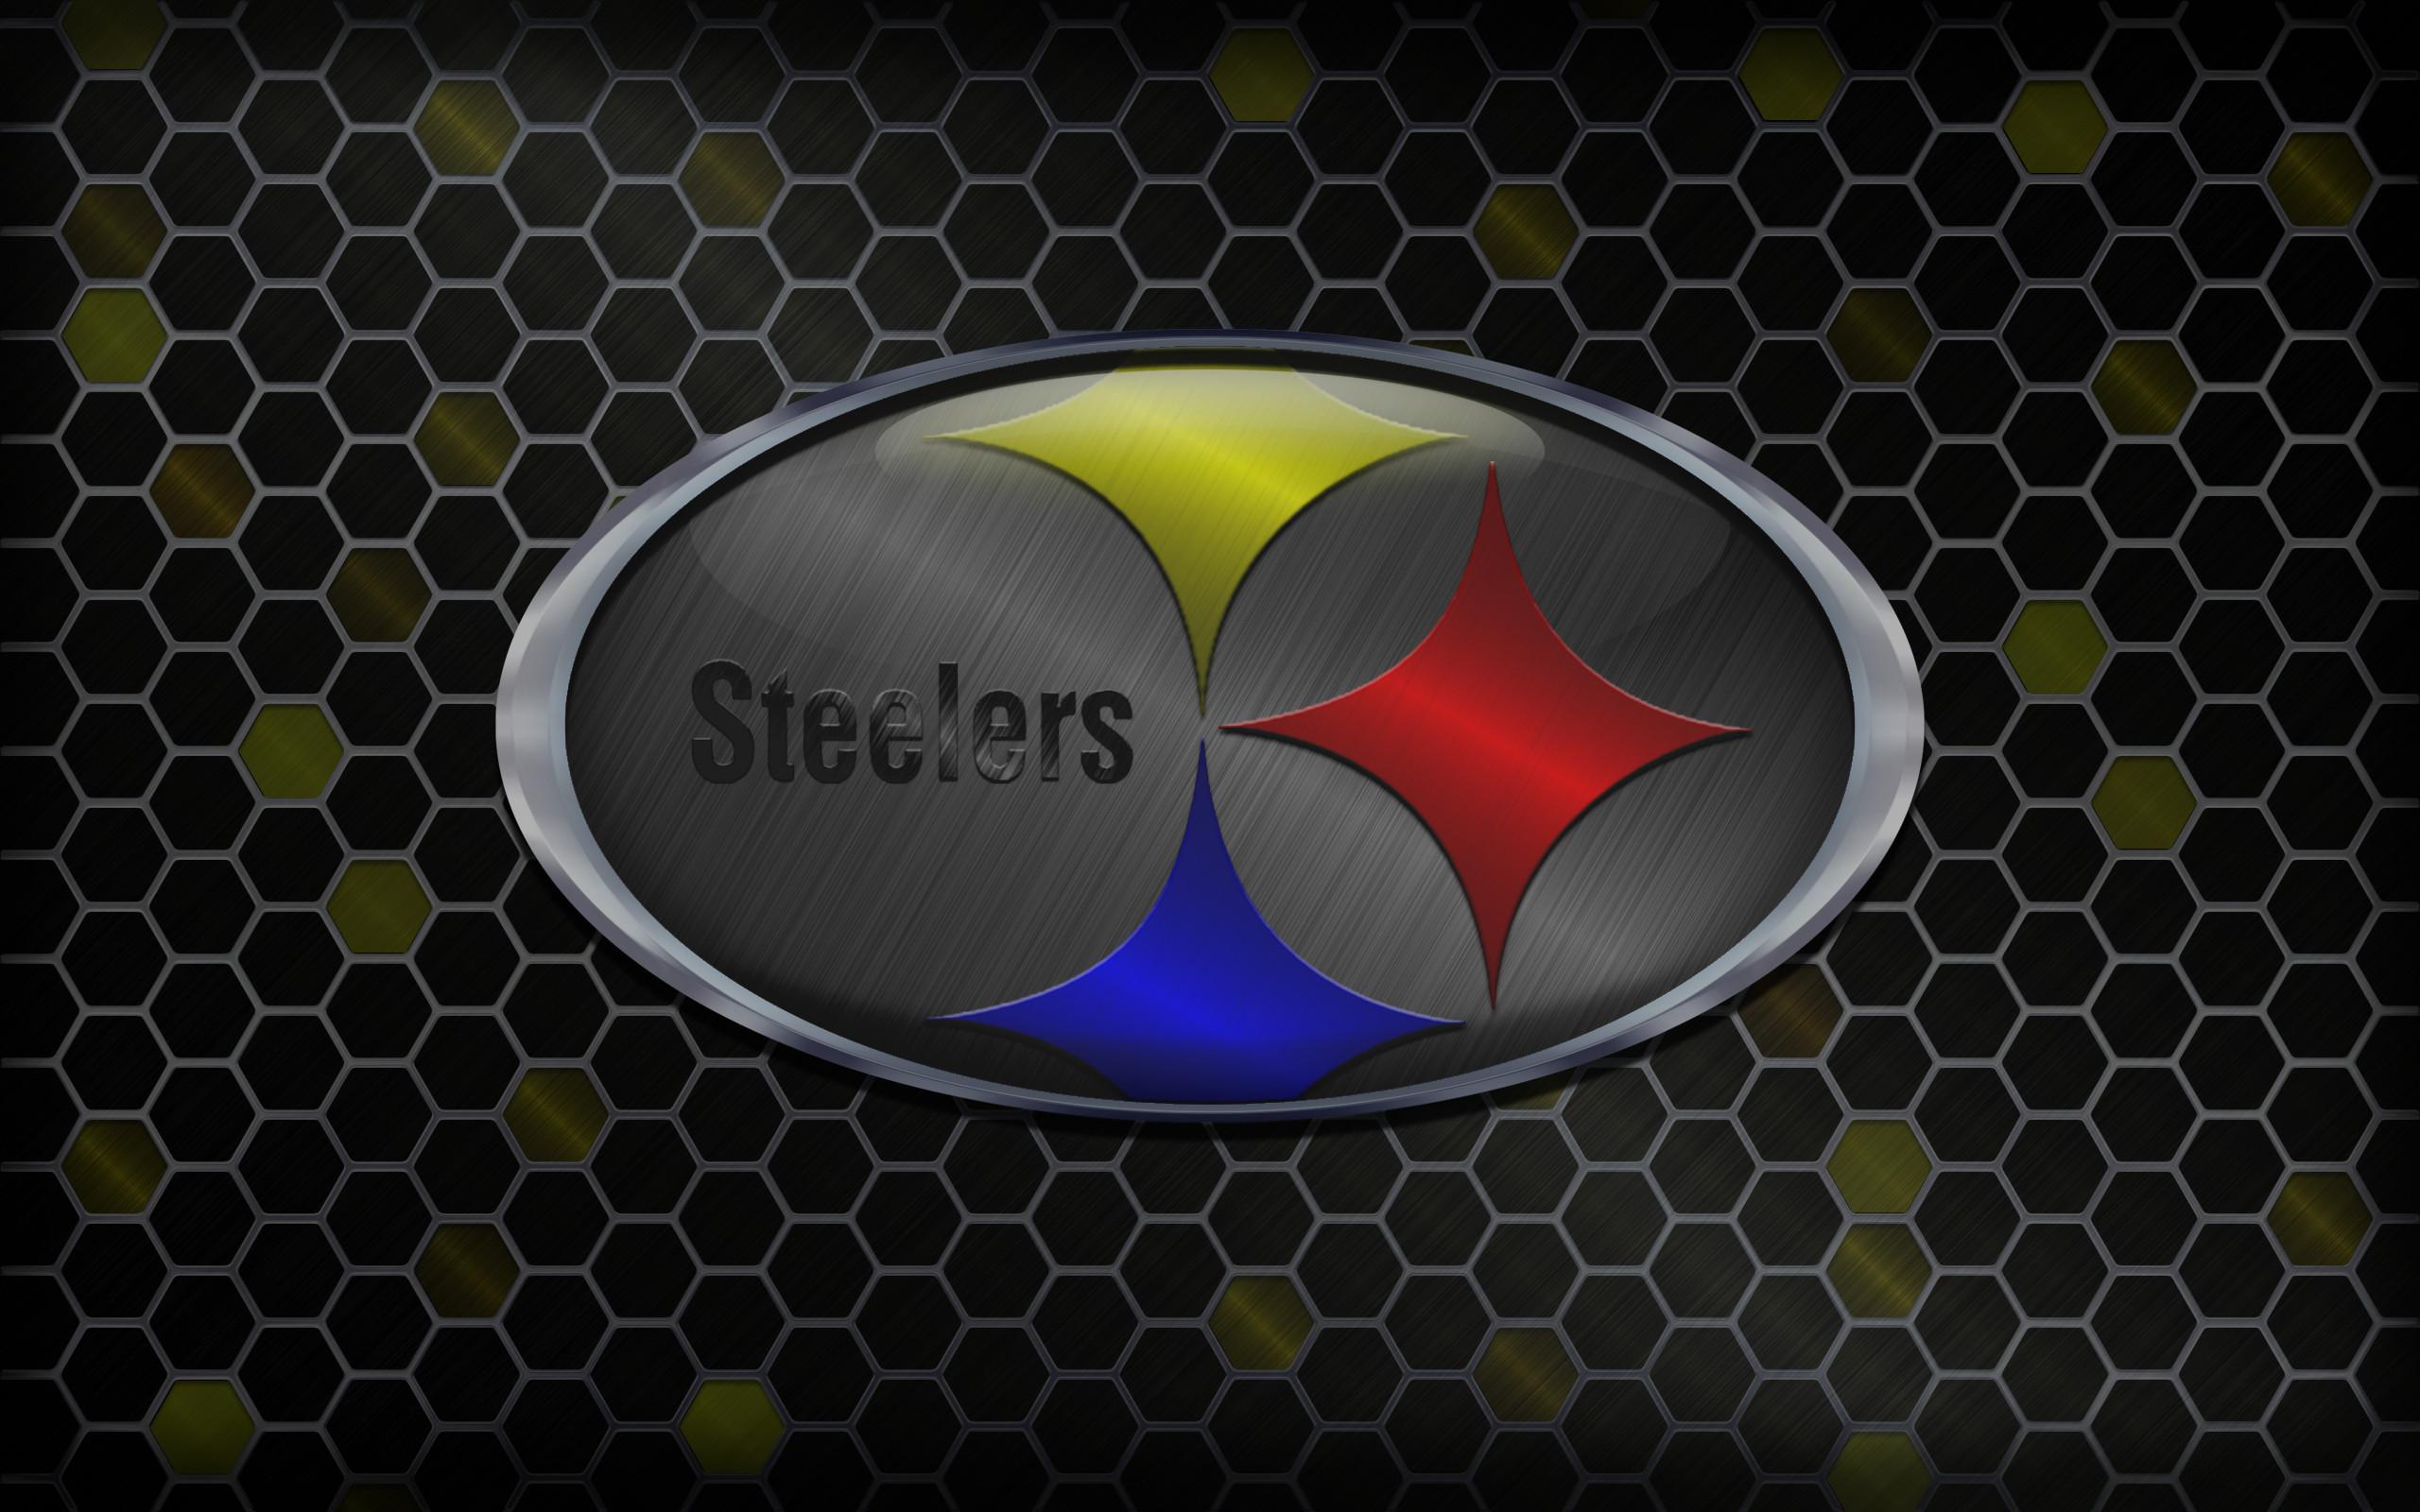 Steelers Iphone Wallpaper 3d Nfl Football Wallpaper 51 Images